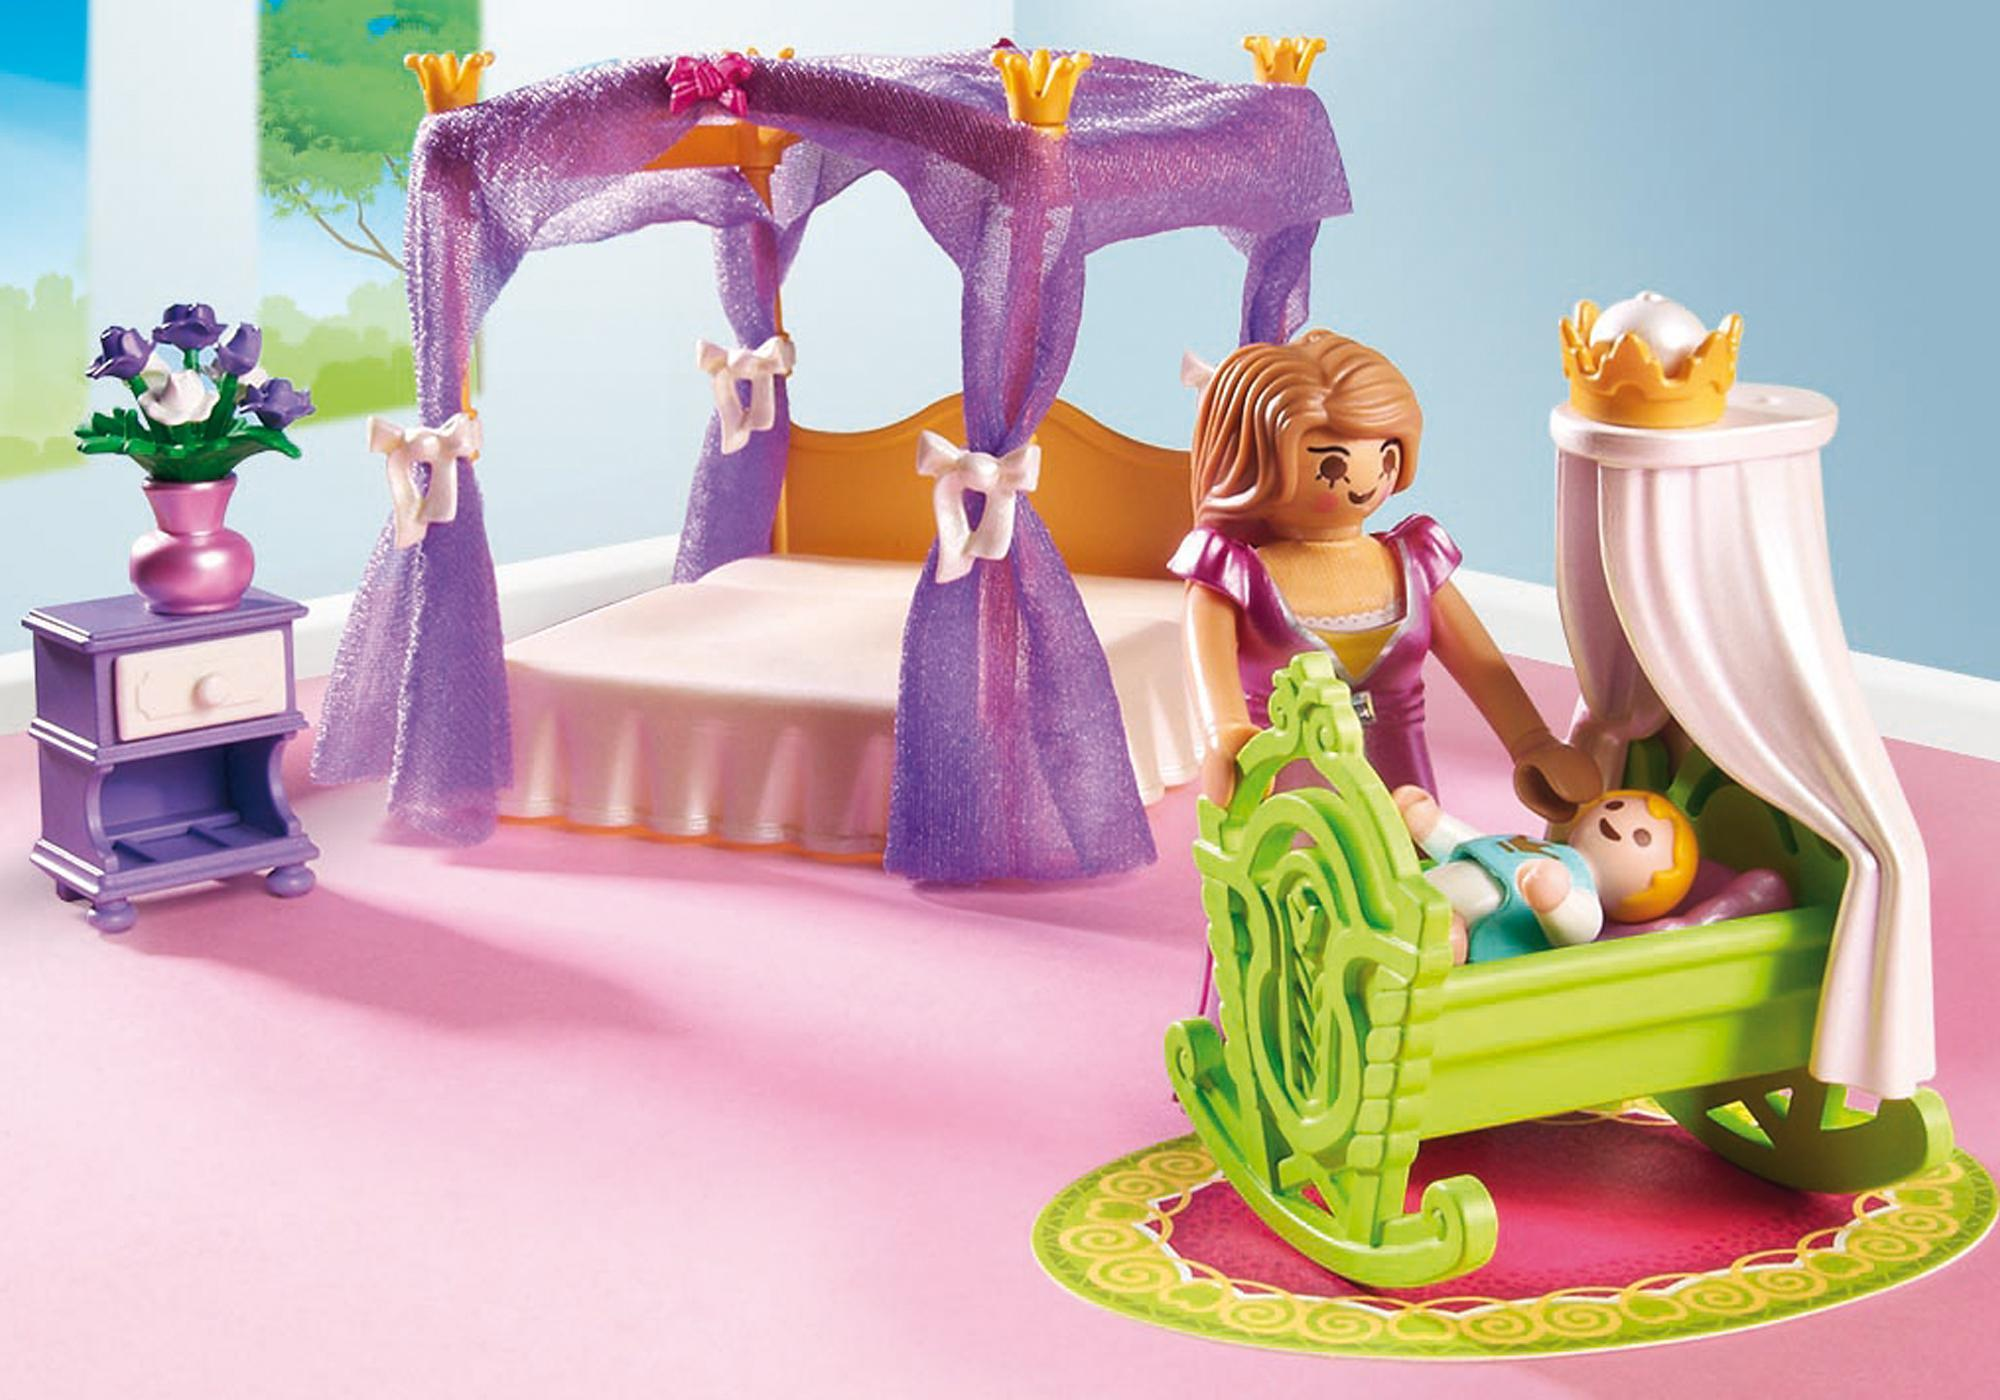 http://media.playmobil.com/i/playmobil/6851_product_extra1